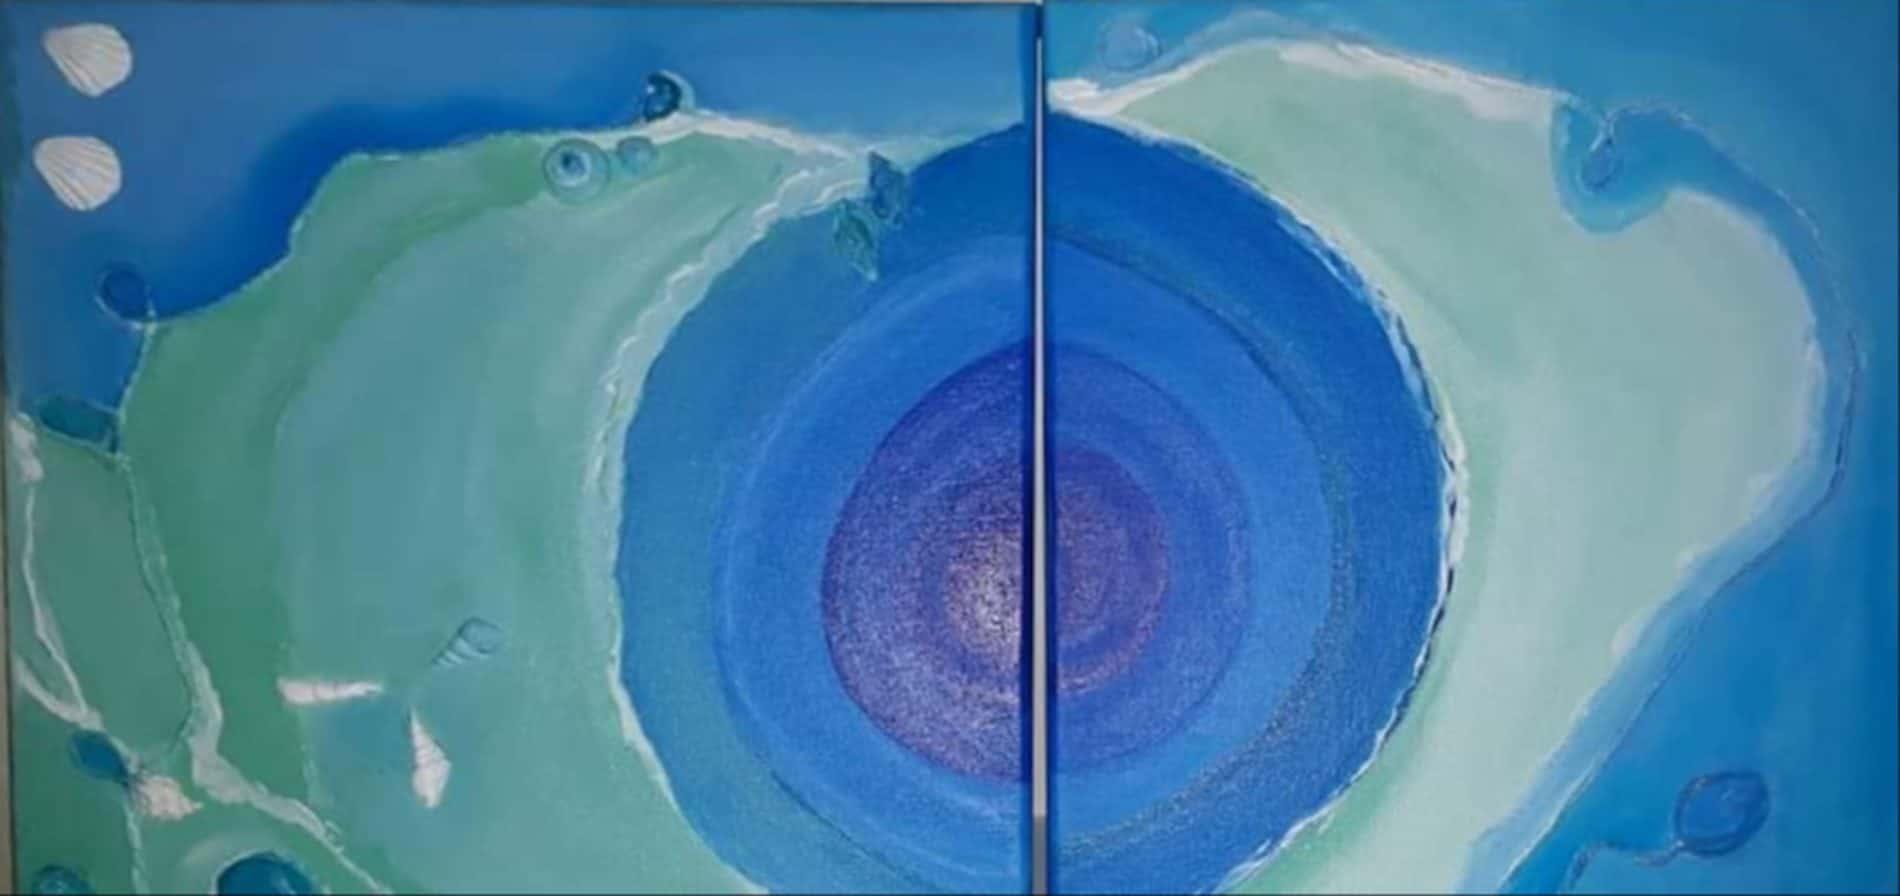 mauritius_arts_juliana_jean_twin_lagoon